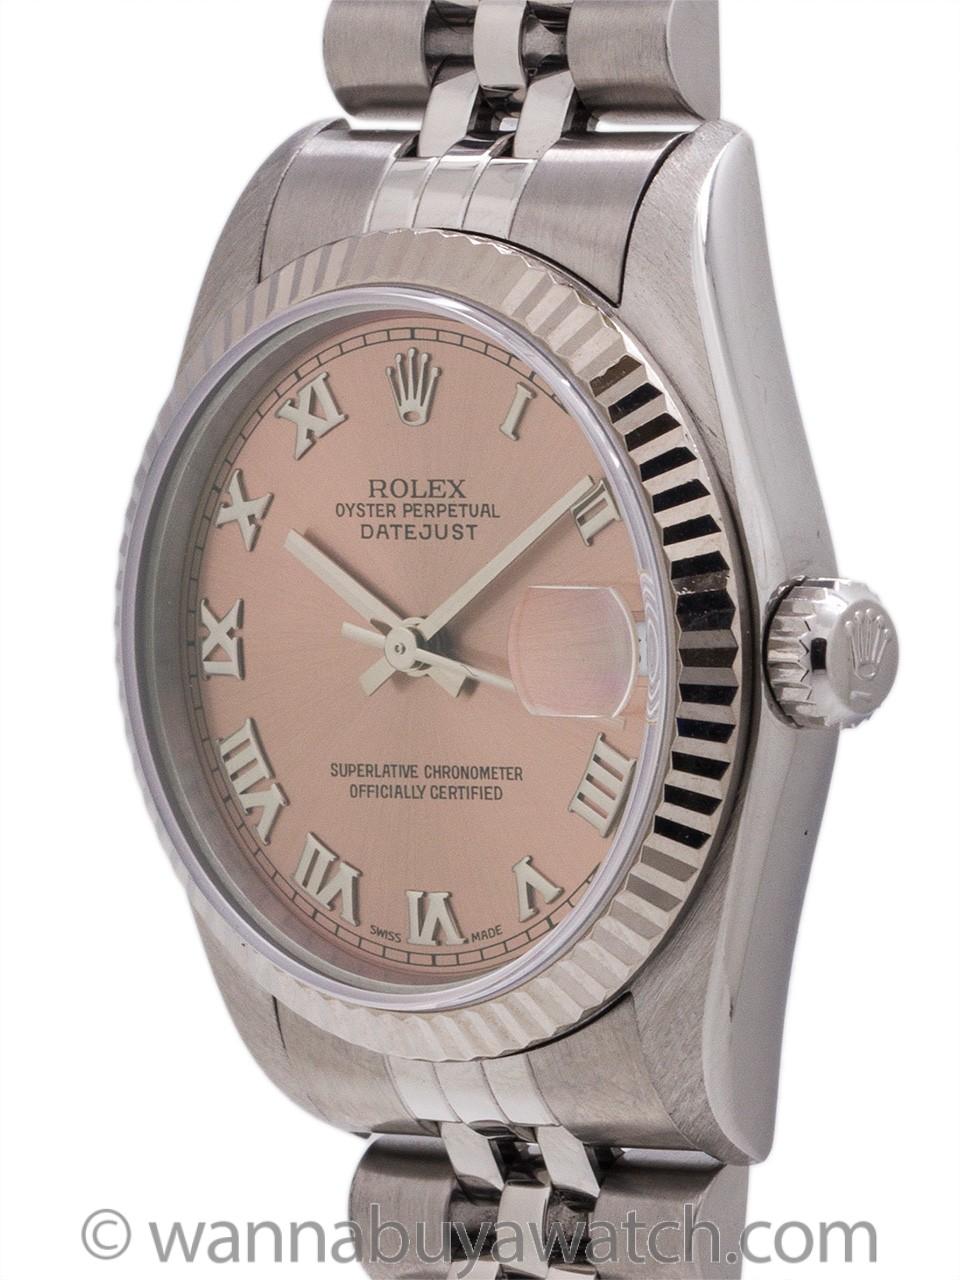 Rolex Midsize Datejust SS/18K WG ref 79174 circa 1997